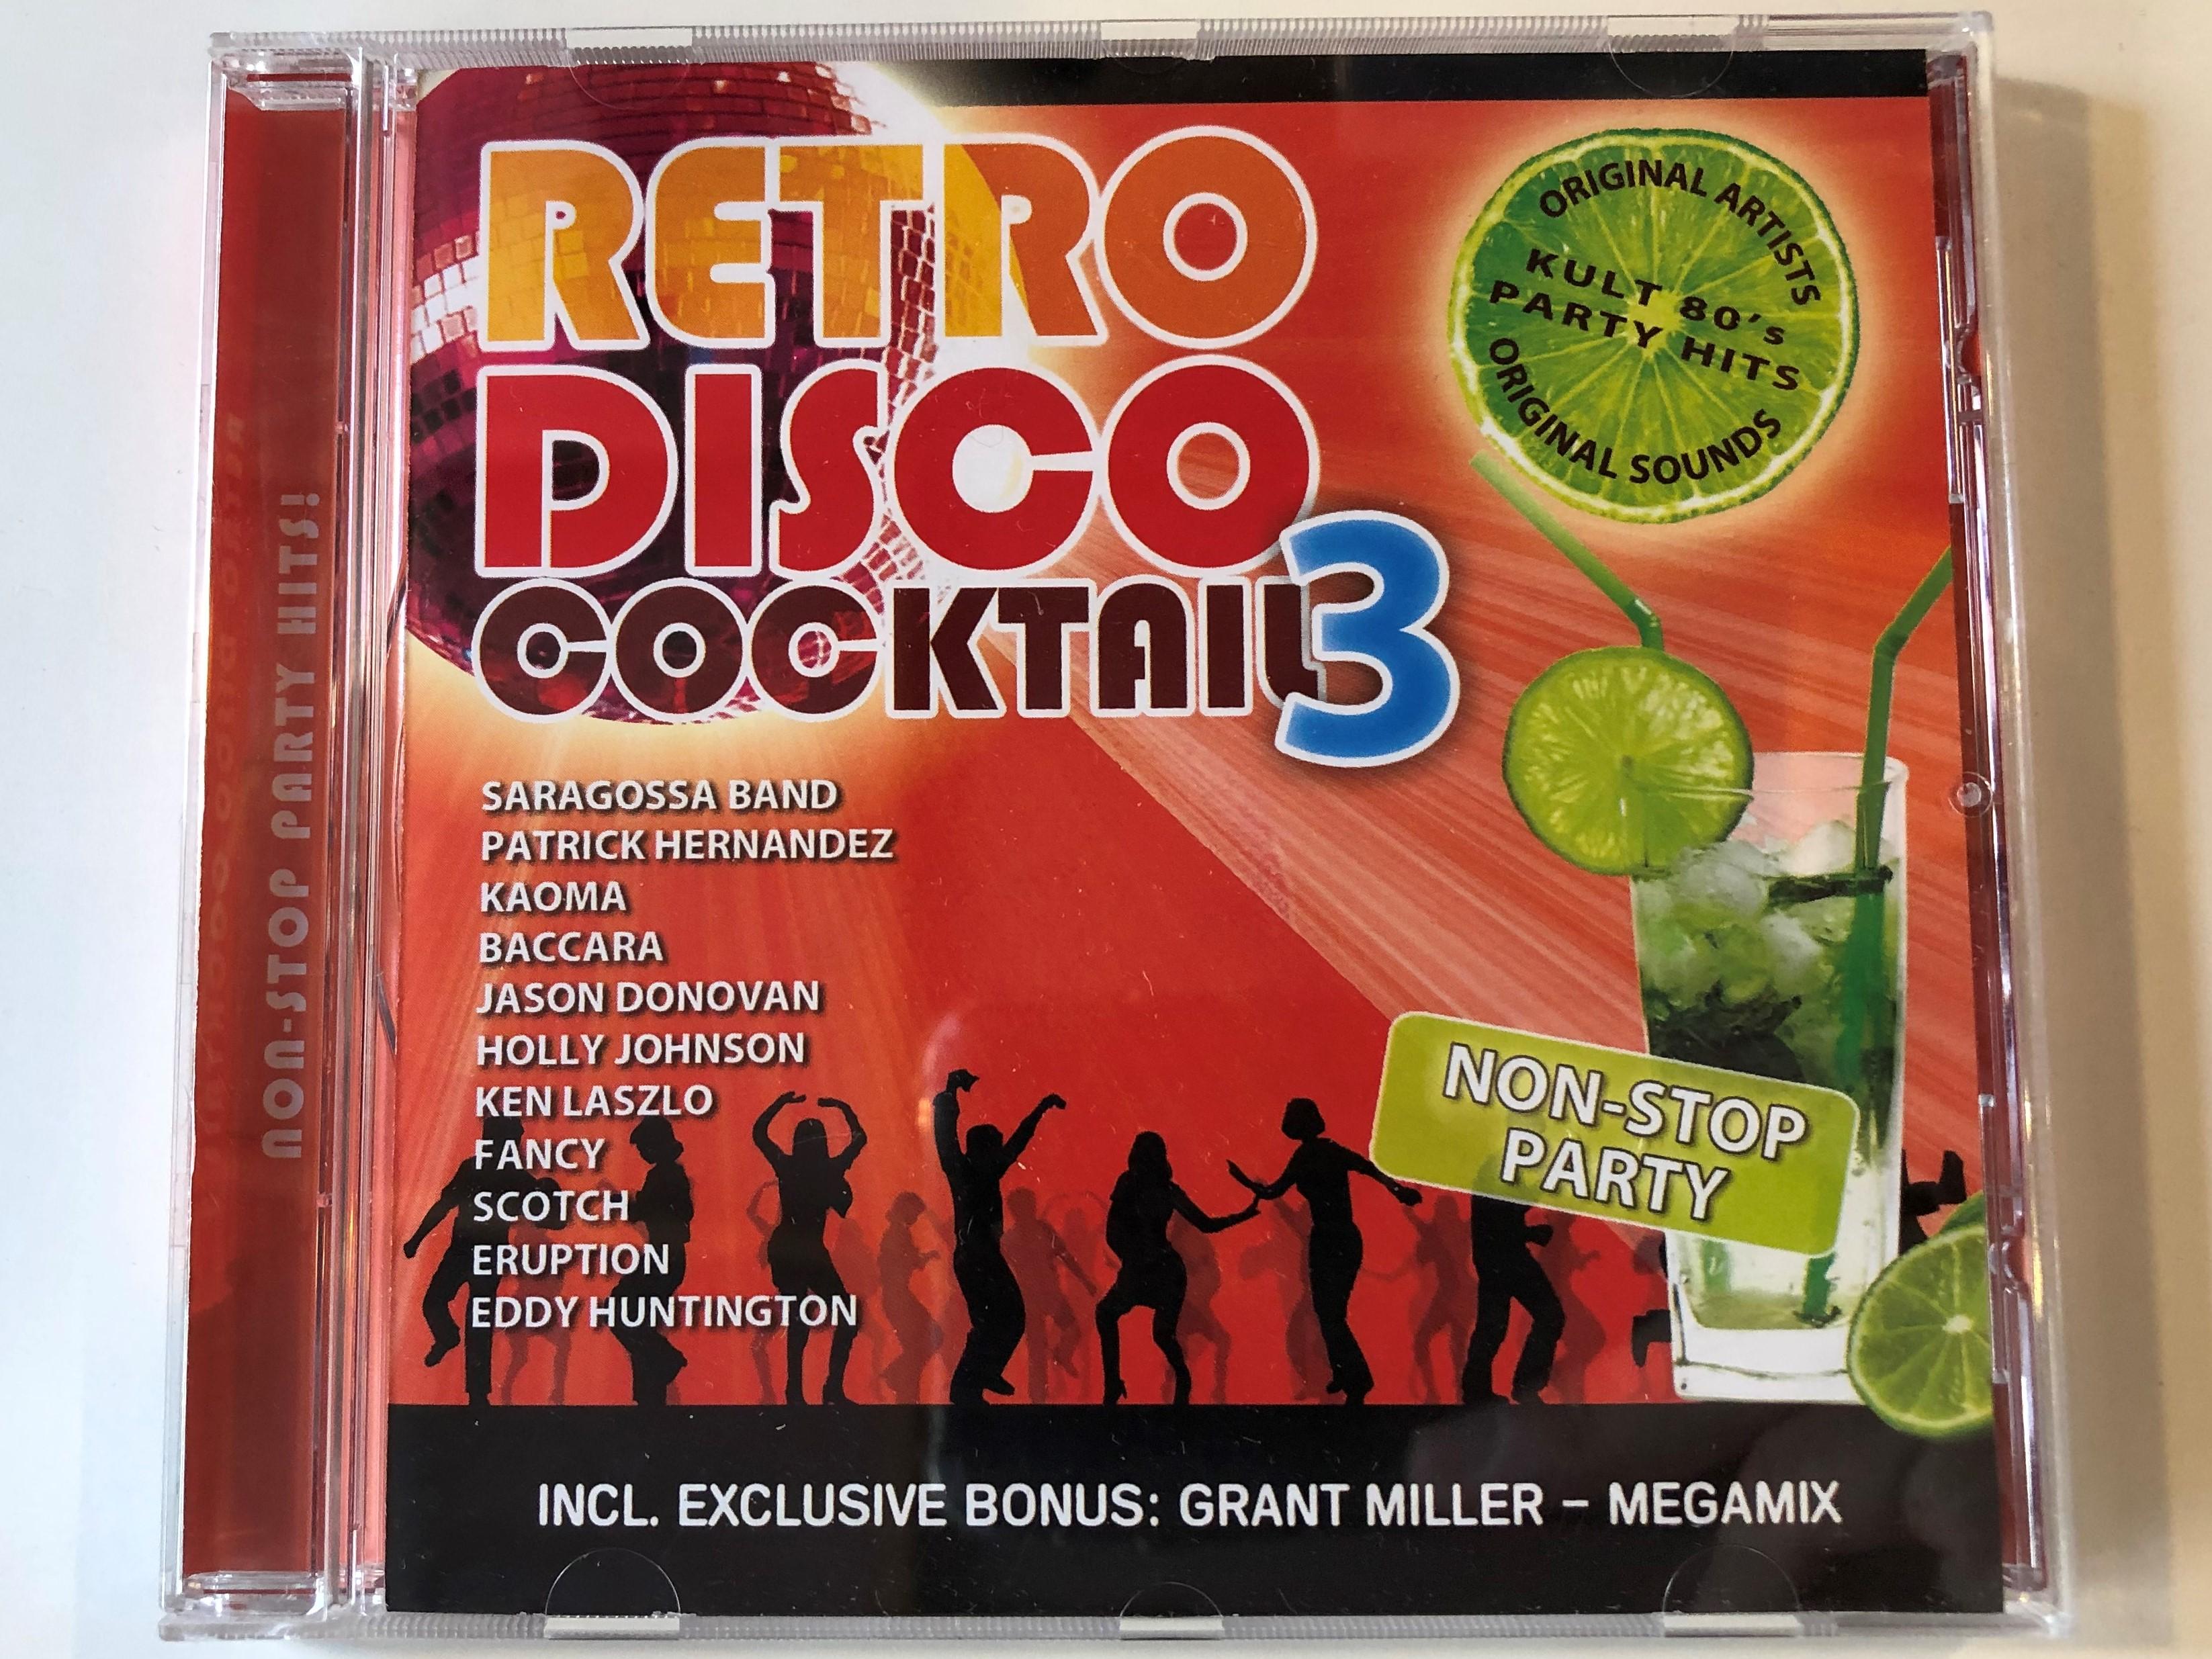 retro-disco-cocktail-3-saragossa-band-patrick-hernandez-kaoma-baccara-jason-donovan-holly-johnson-ken-laszlo-fancy-scotch-eruption-eddy-huntington-incl.-exclusive-bonus-grant-miller-1-.jpg